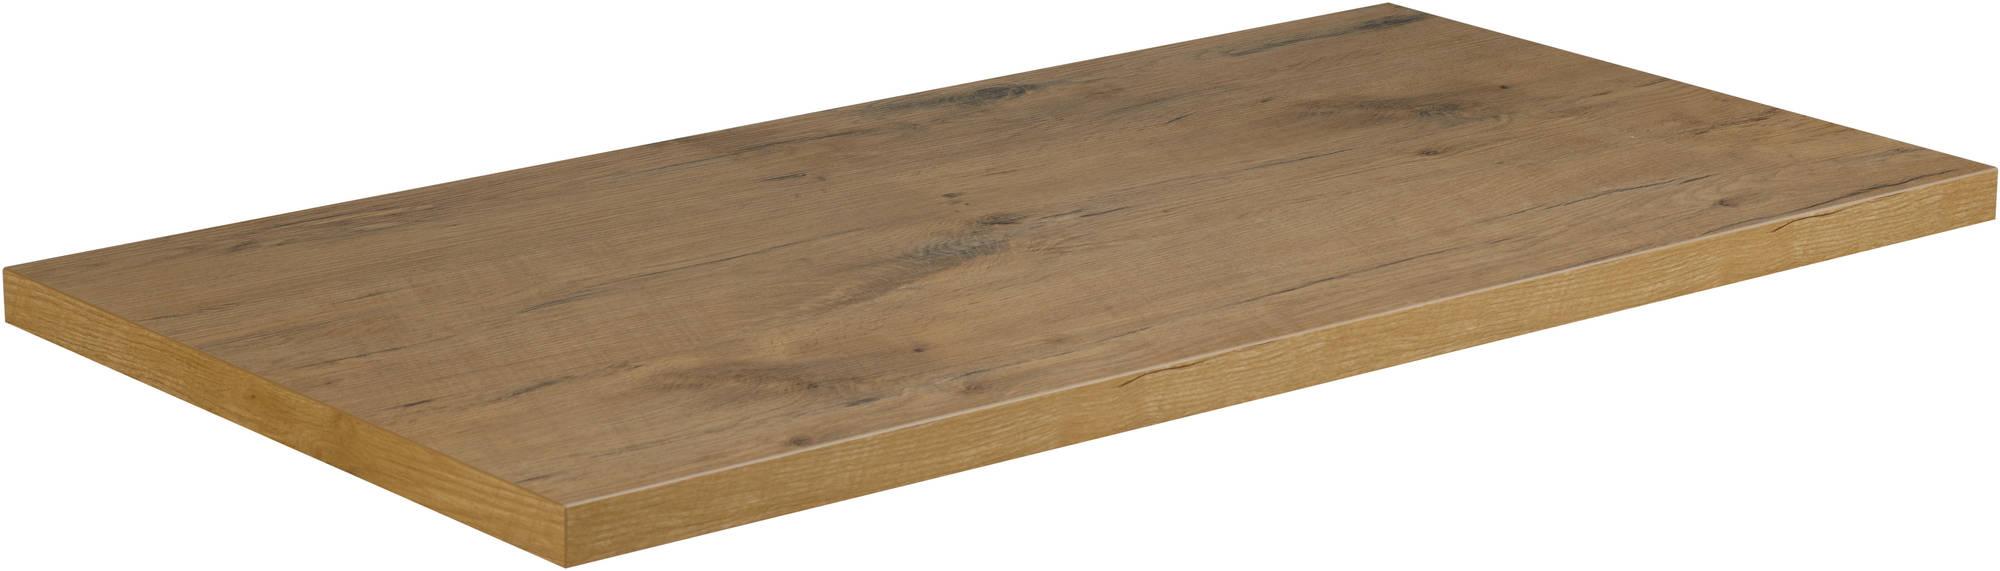 Saniselect Socan Wastafelblad 160x51,5cm Bardolino Eiken